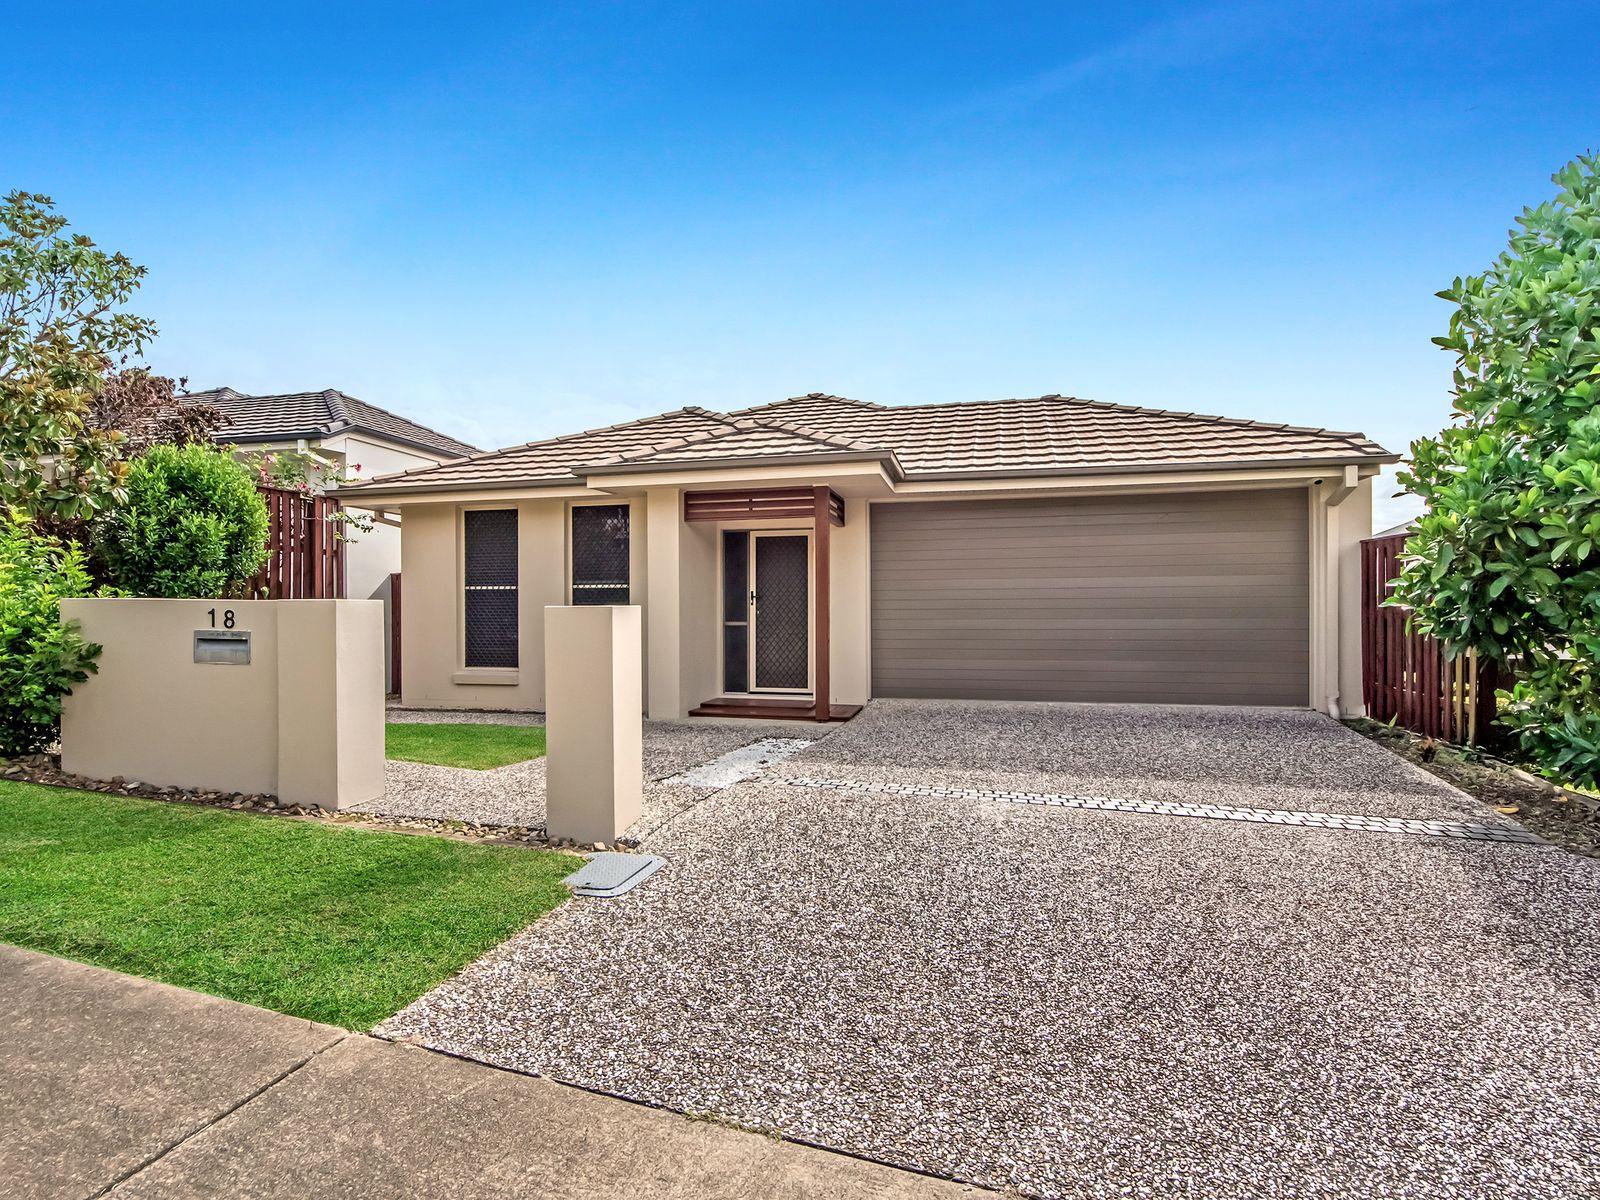 18 Hilltop Terrace, Springfield Lakes, QLD 4300